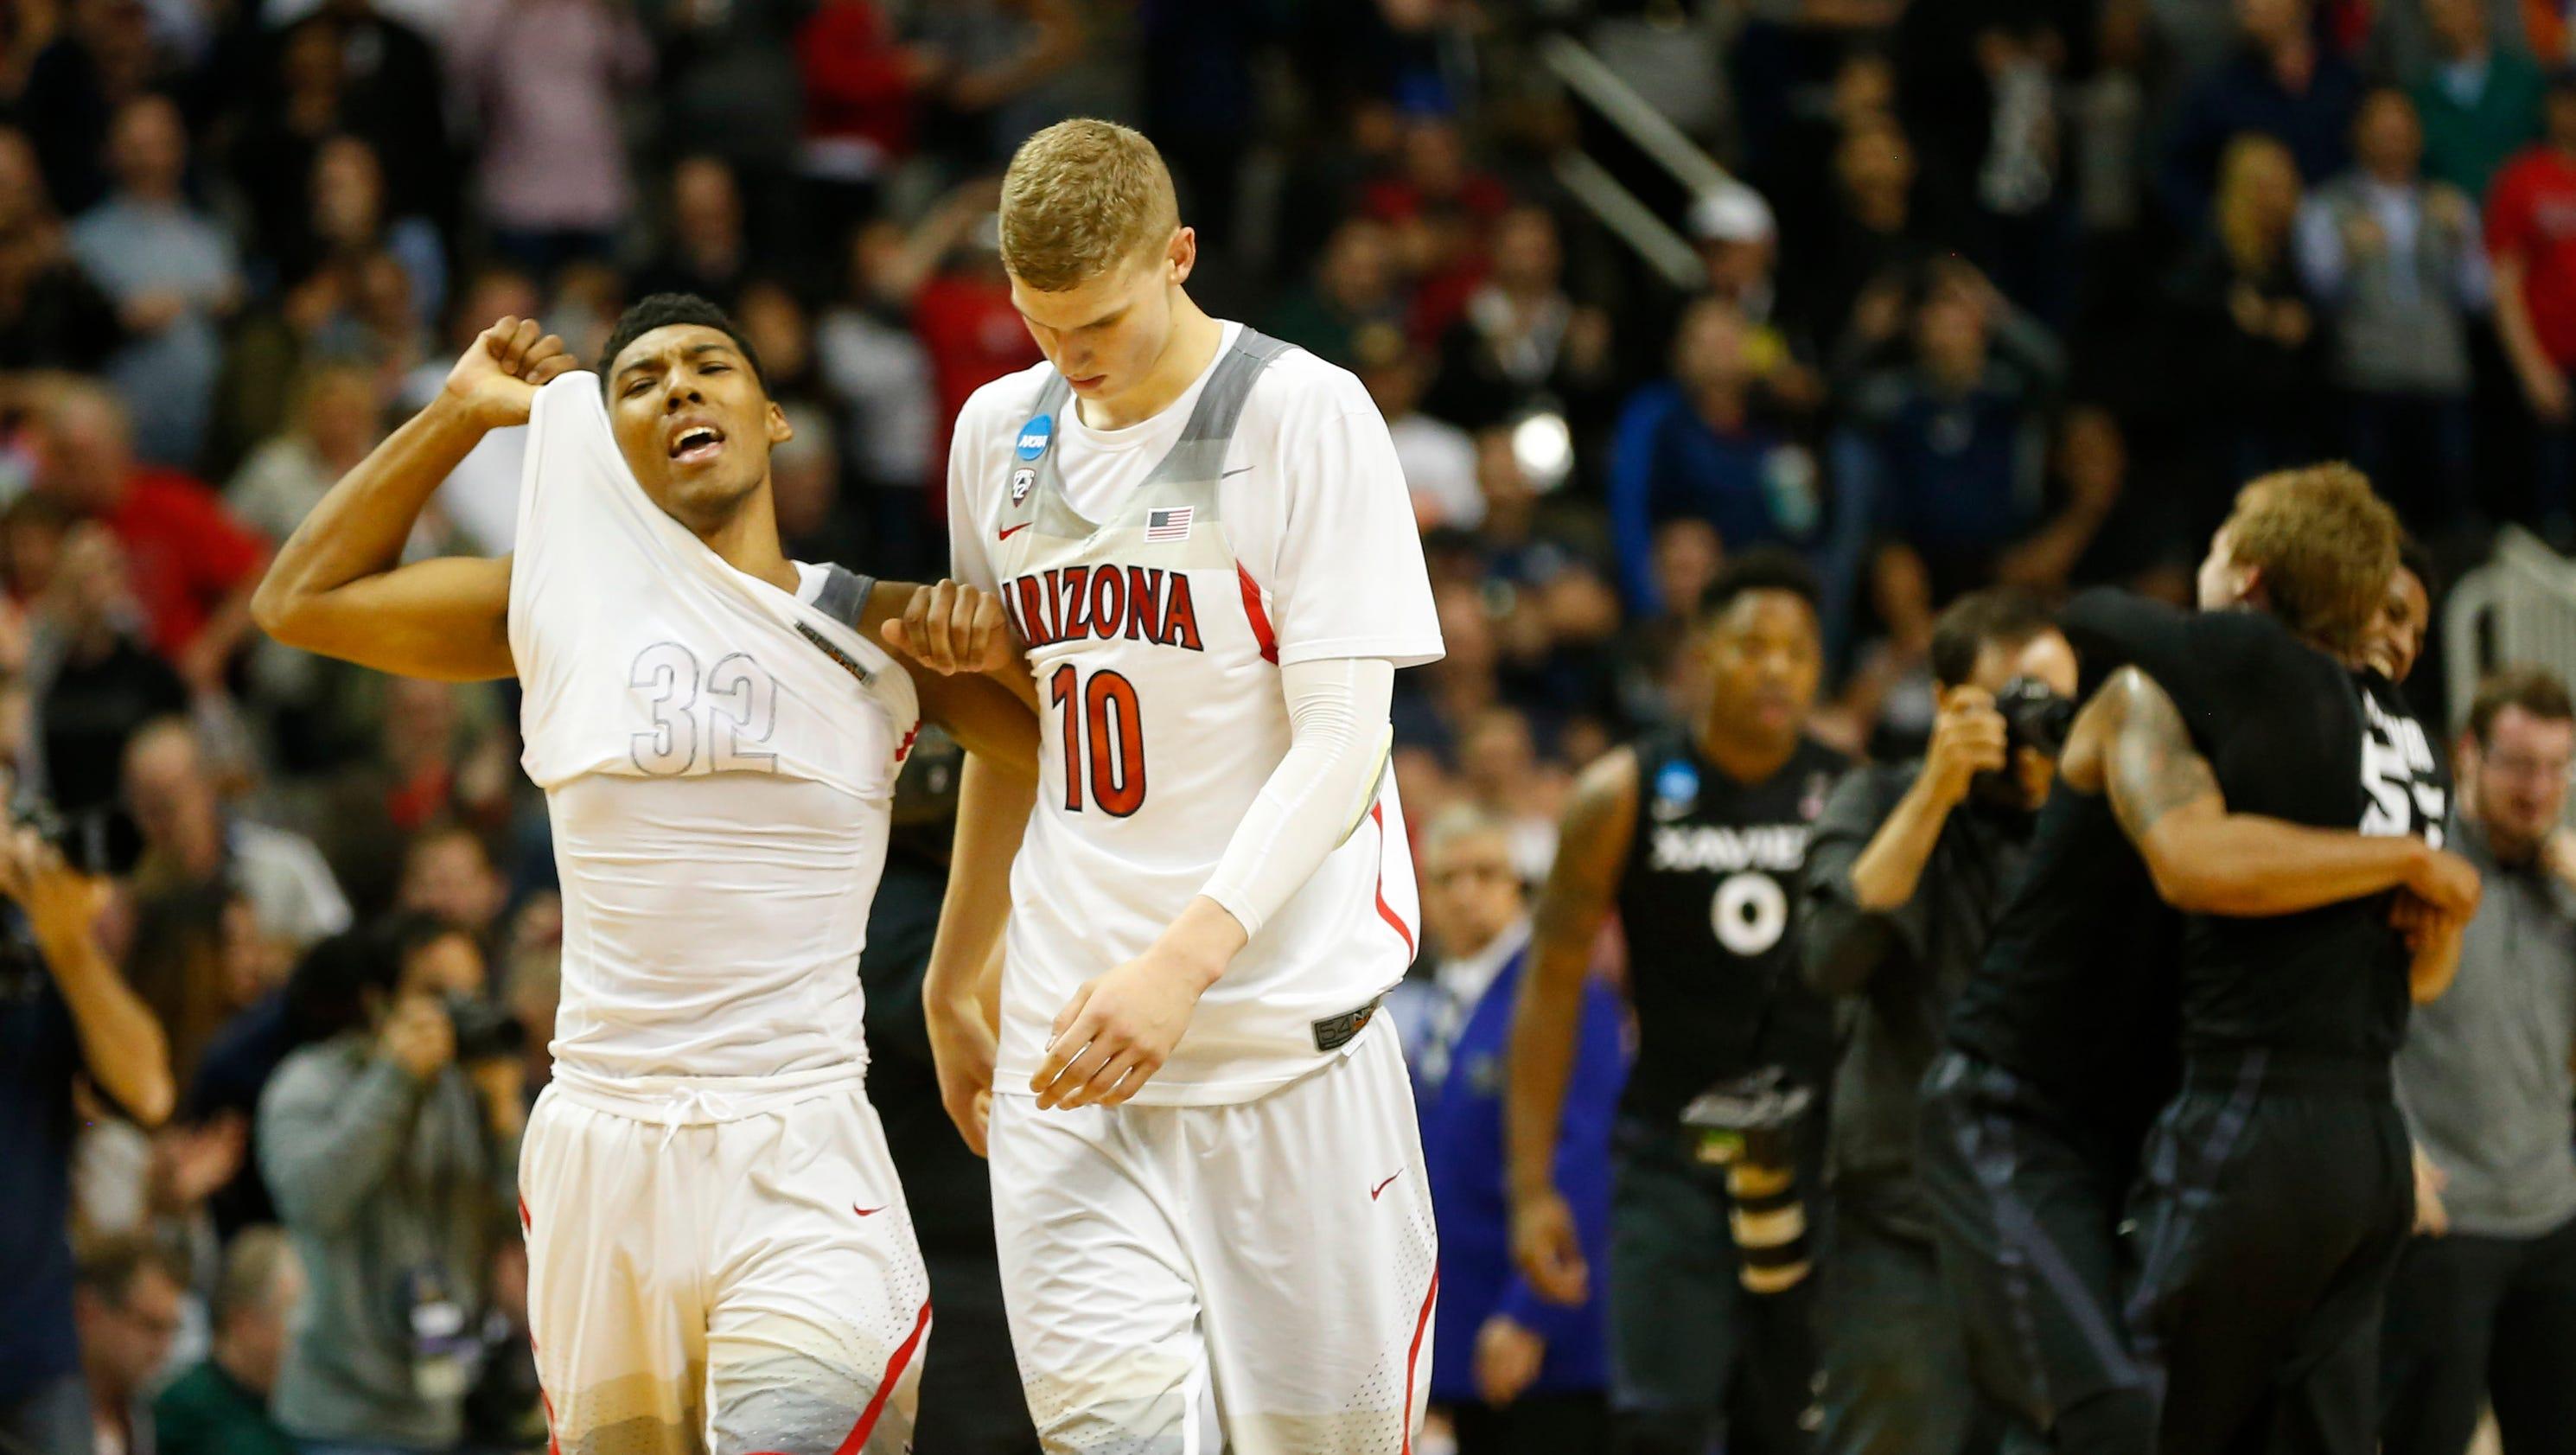 Arizona Wildcats lose to Xavier in NCAA Tournament